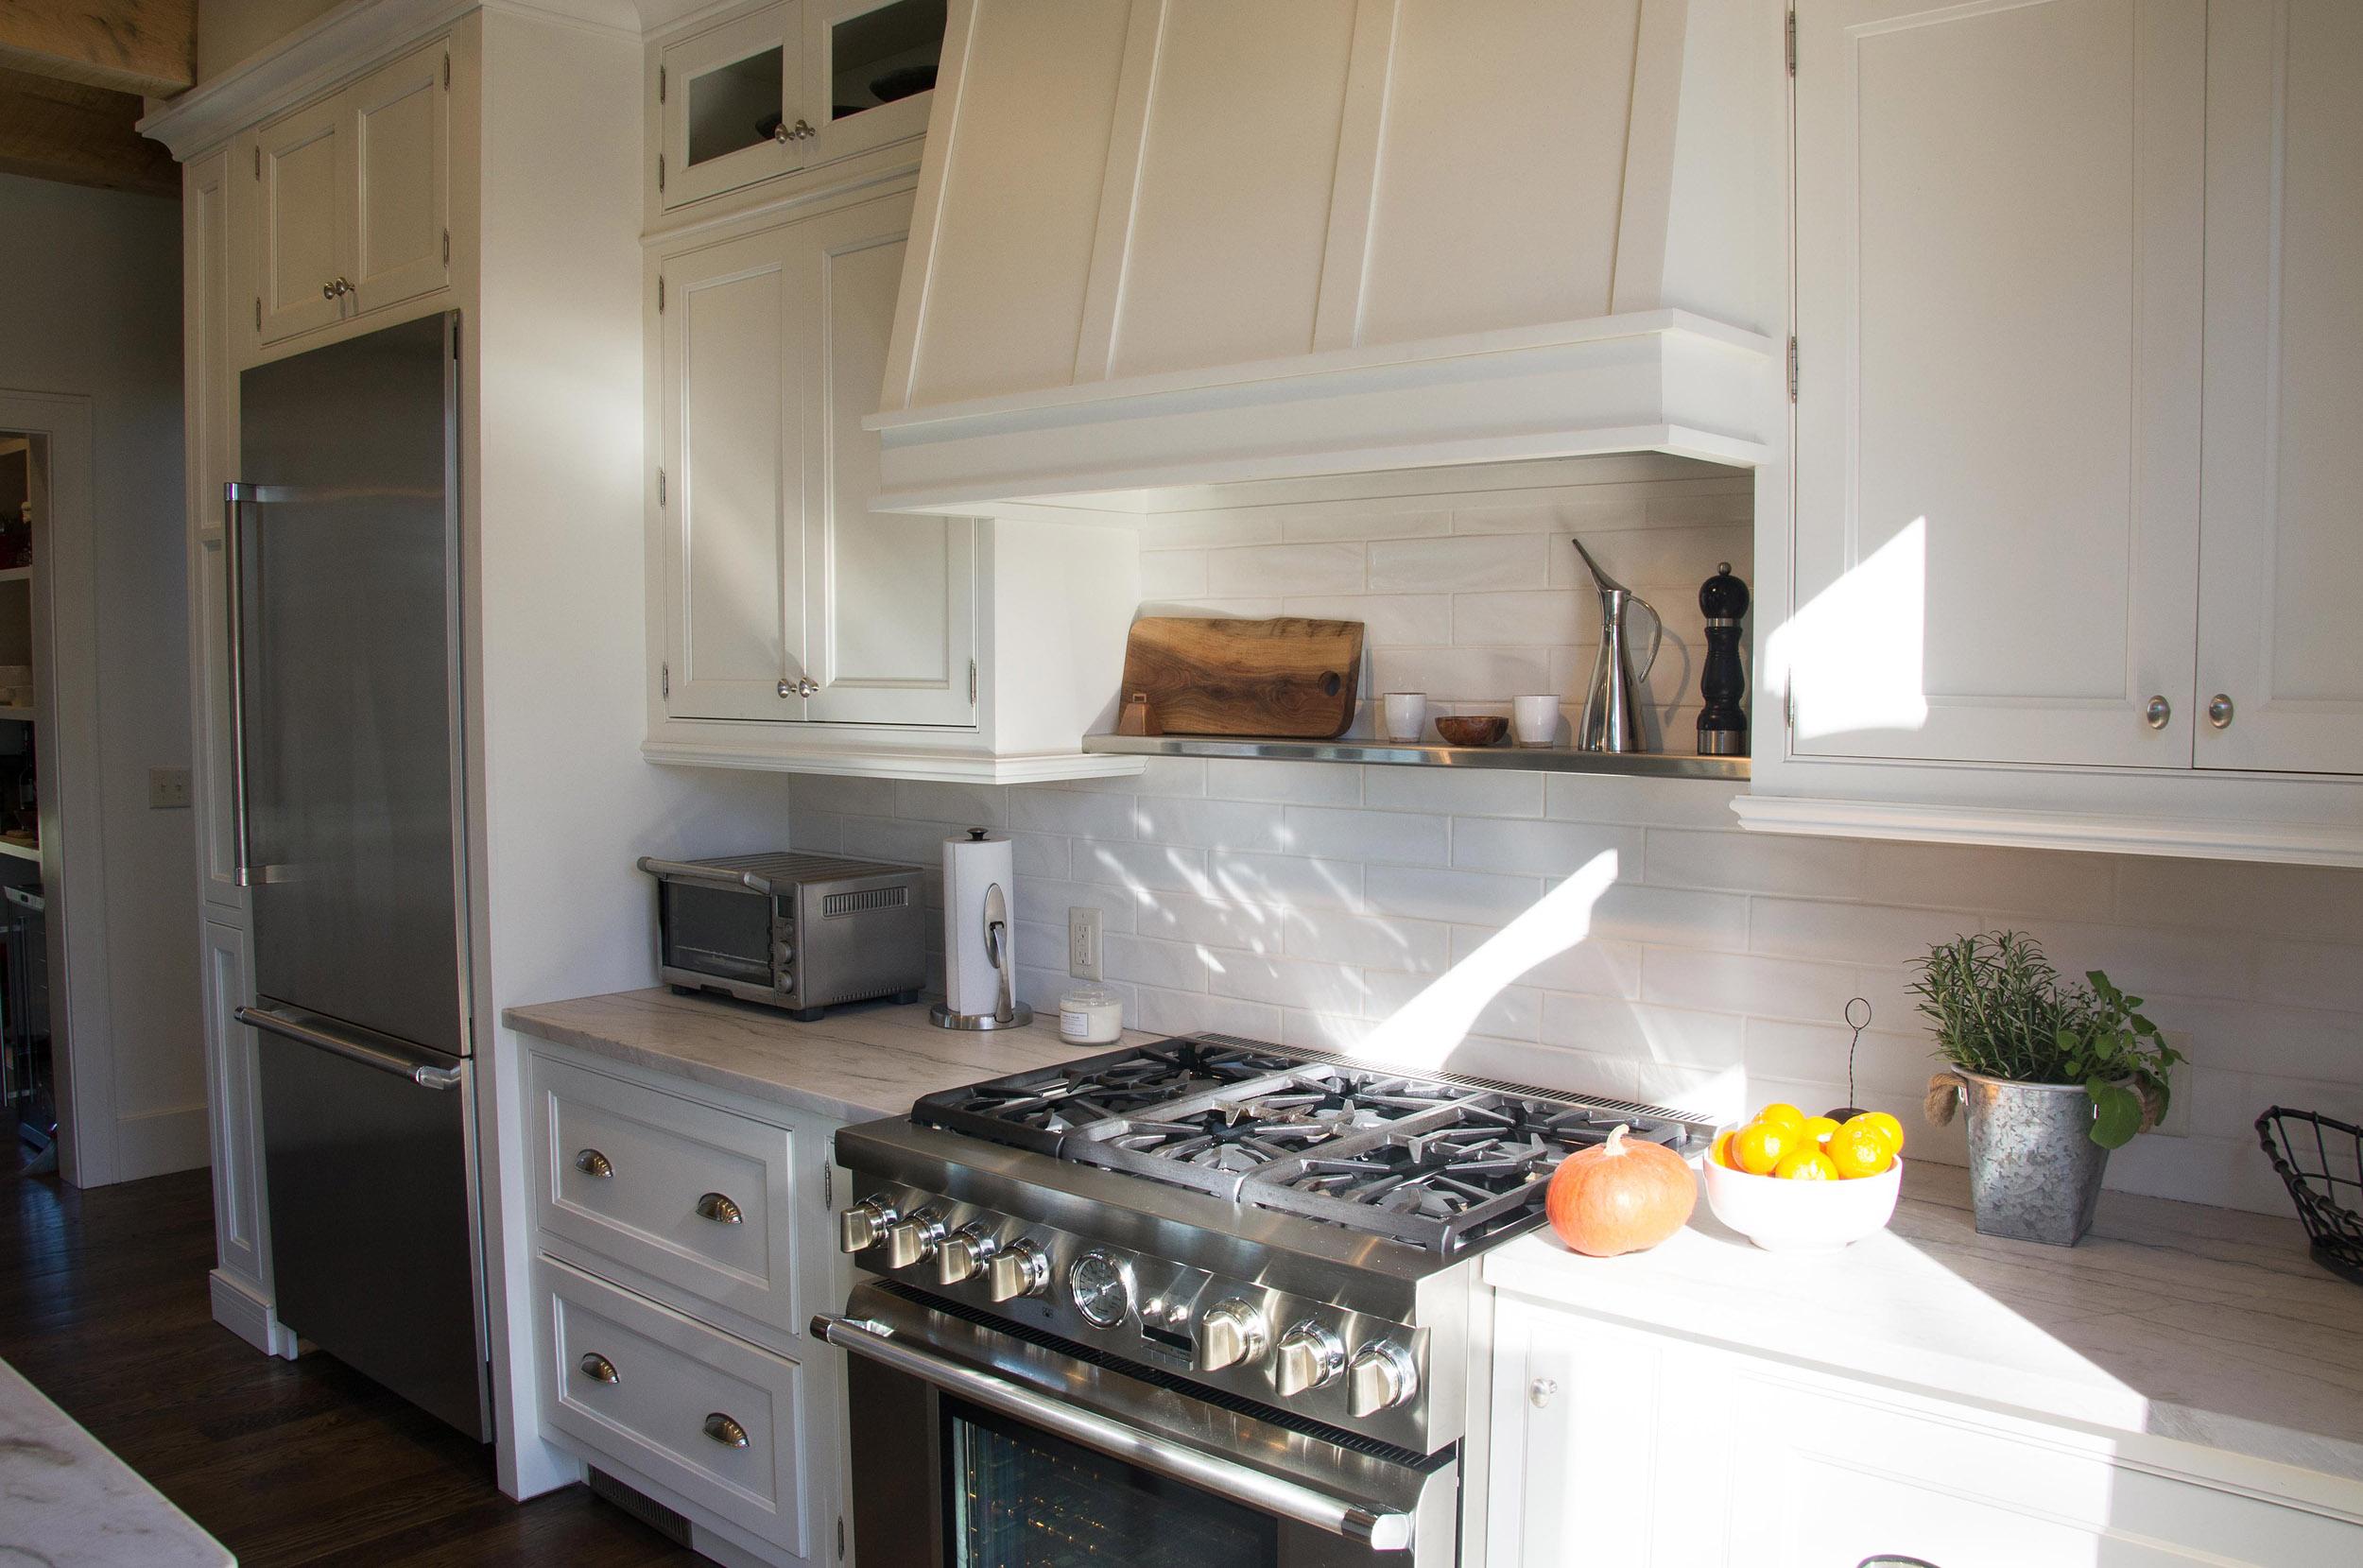 cabinets-02.jpg